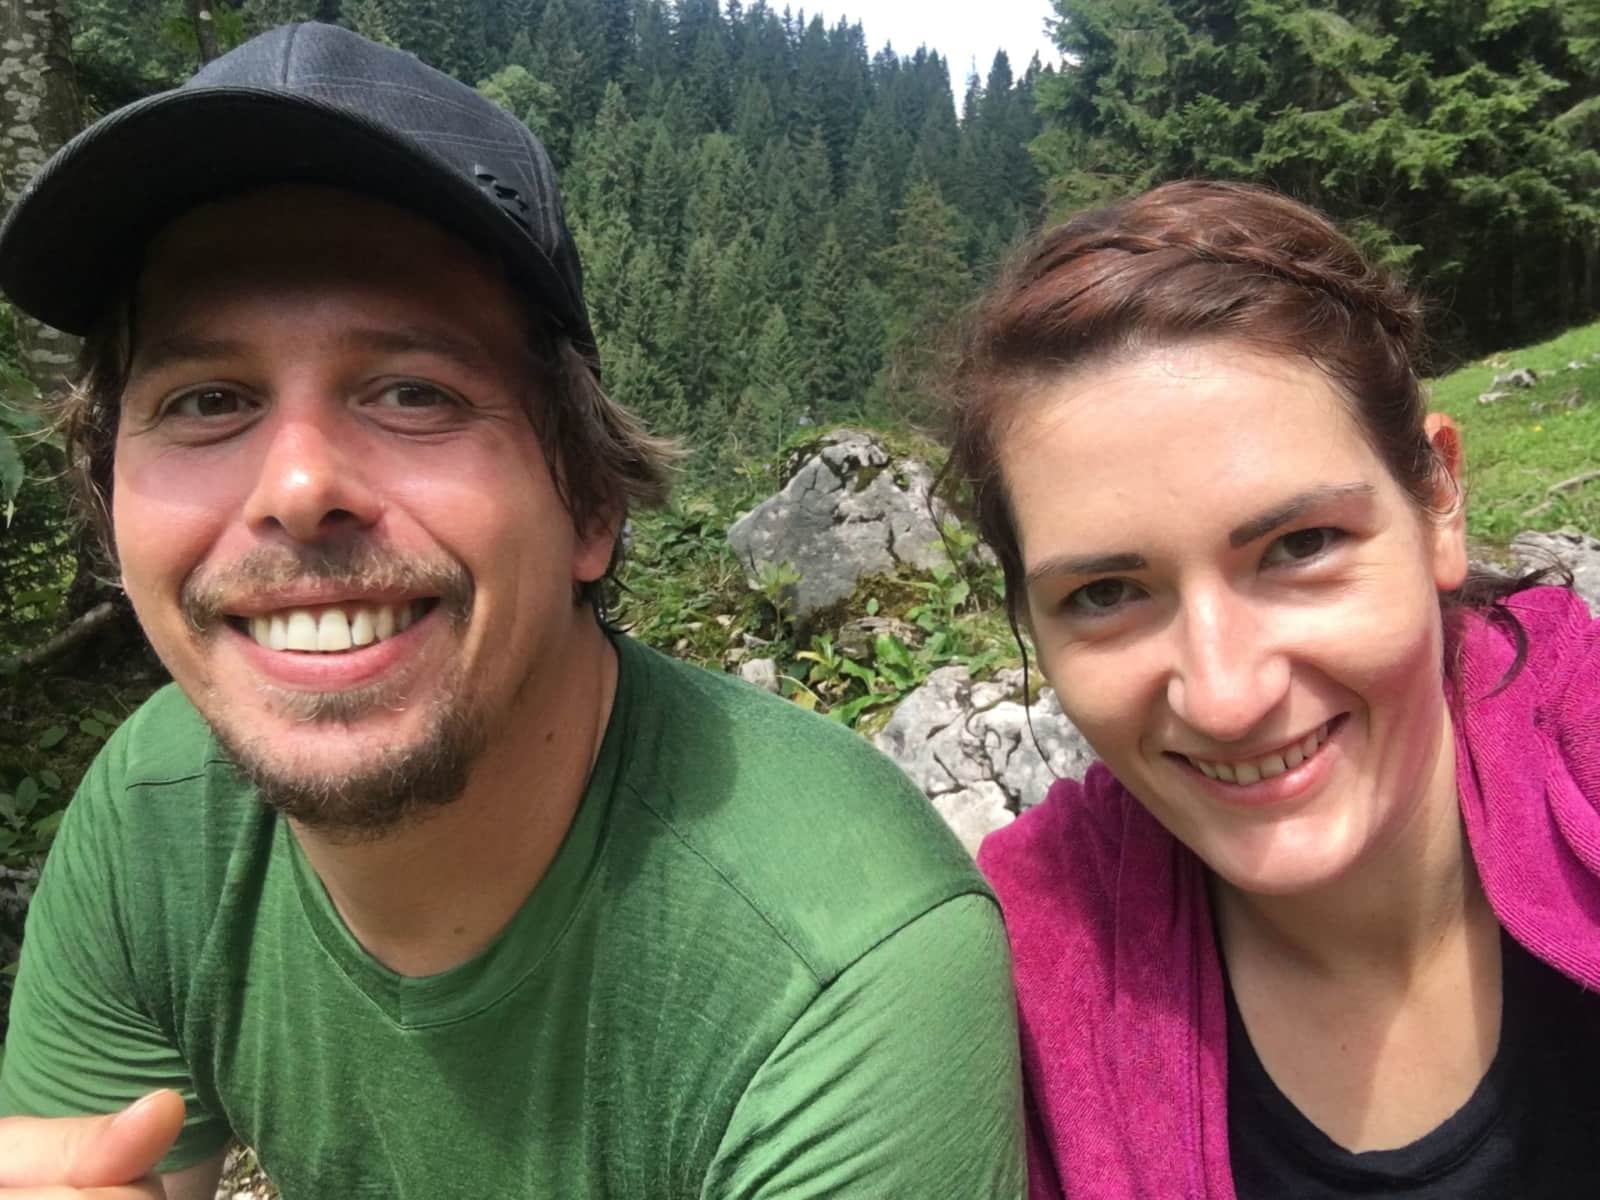 Steffi & Benno from Munich, Germany